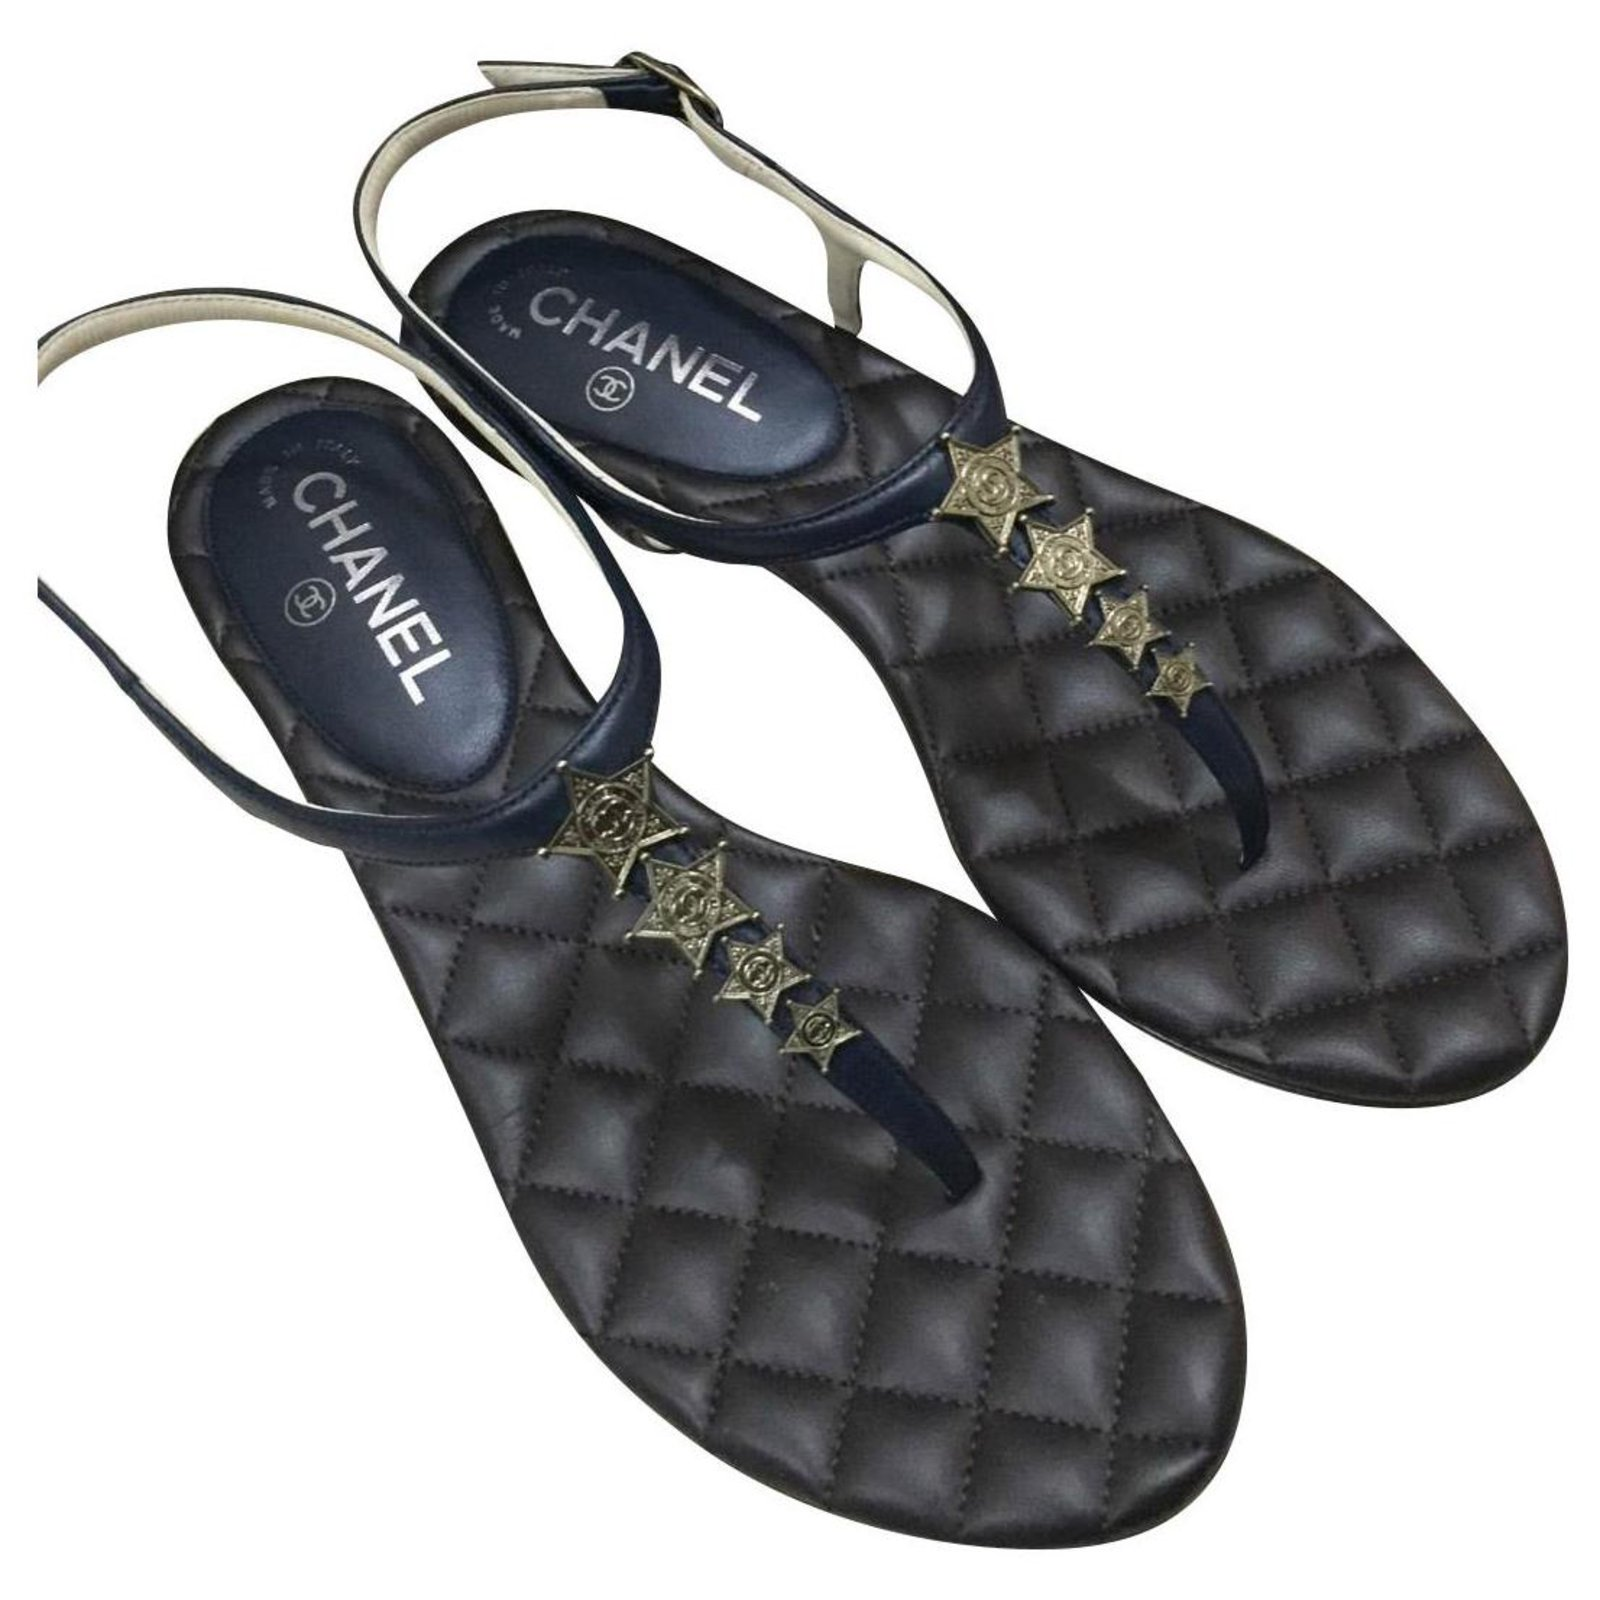 Chanel Sandals Sandals Leather Blue ref